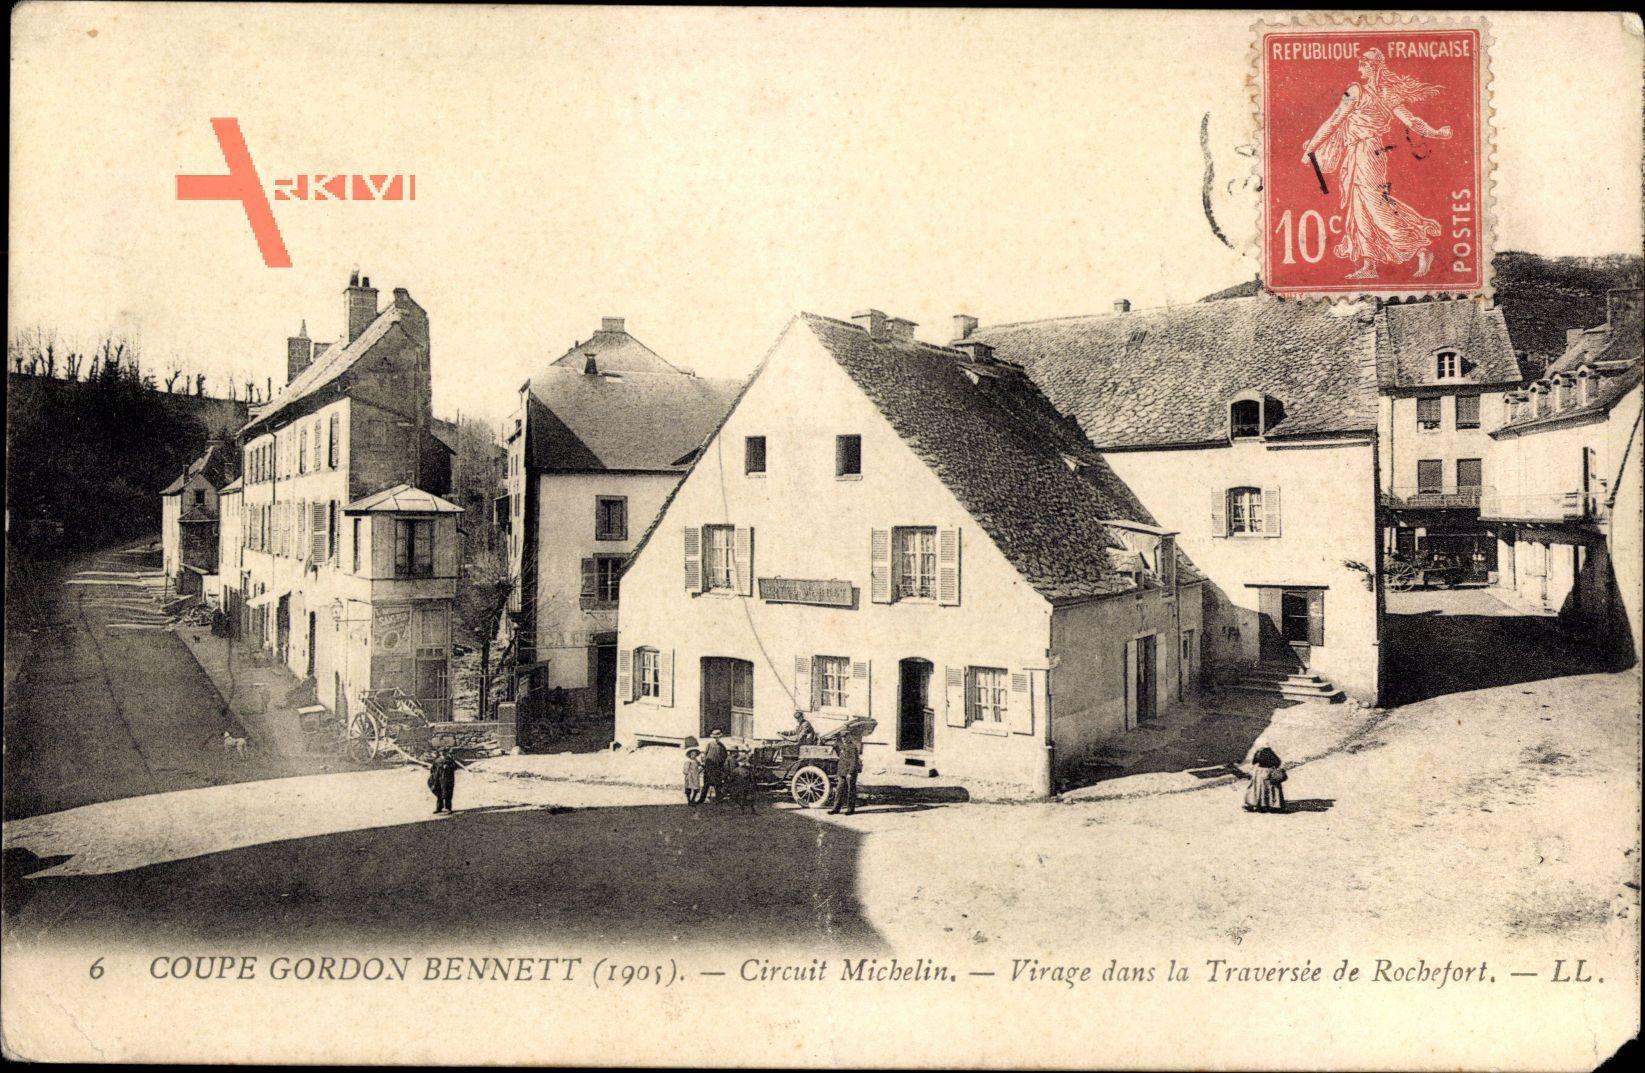 Coupe Gordon Bennett 1905, Circuit Michelin, Traversée de Rochefort